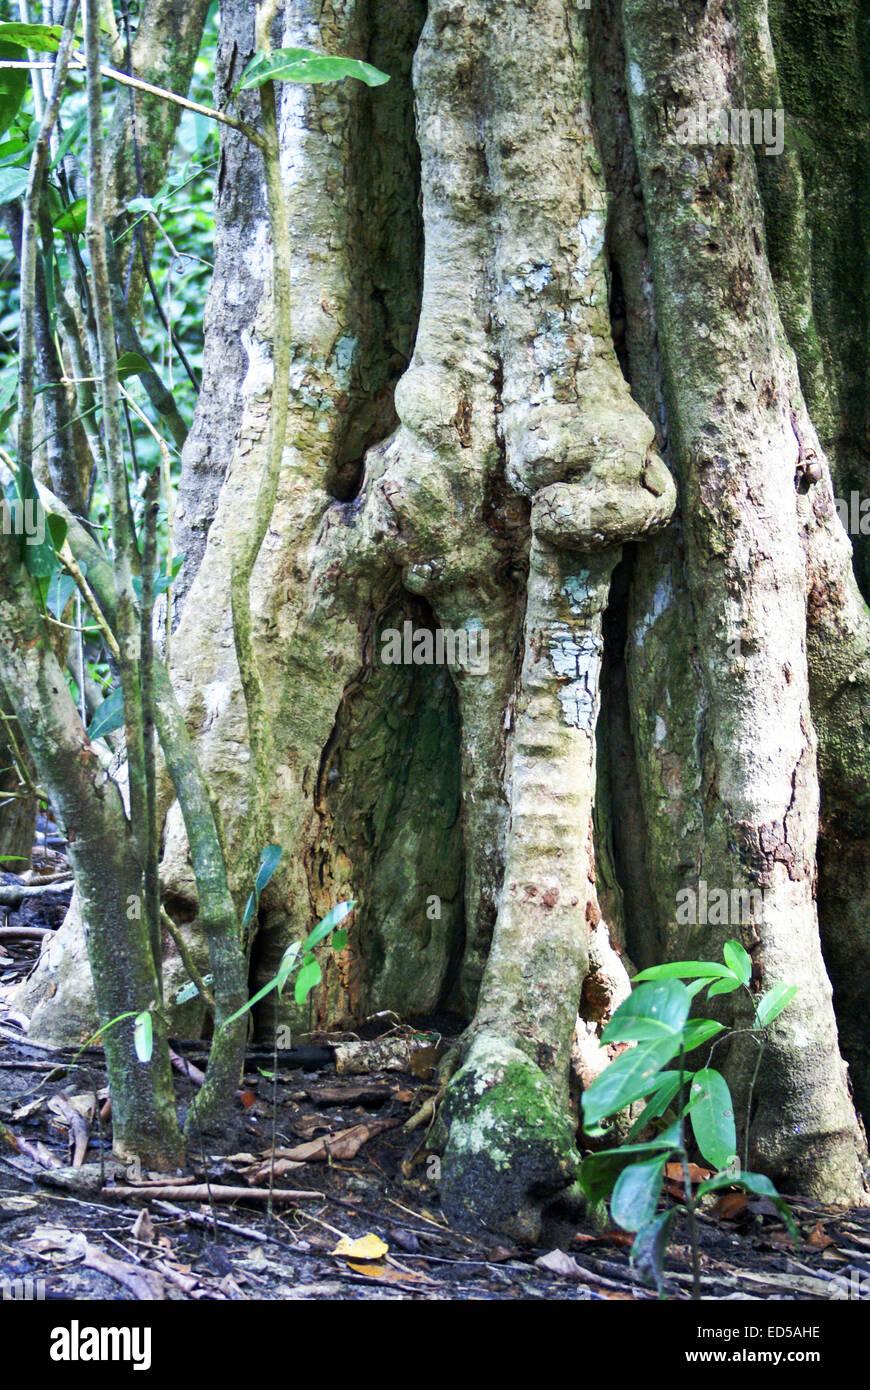 Ficus tree trunk Manuel Antonio National Park, (Parque Nacional Manuel Antonio), Costa Rica - Stock Image